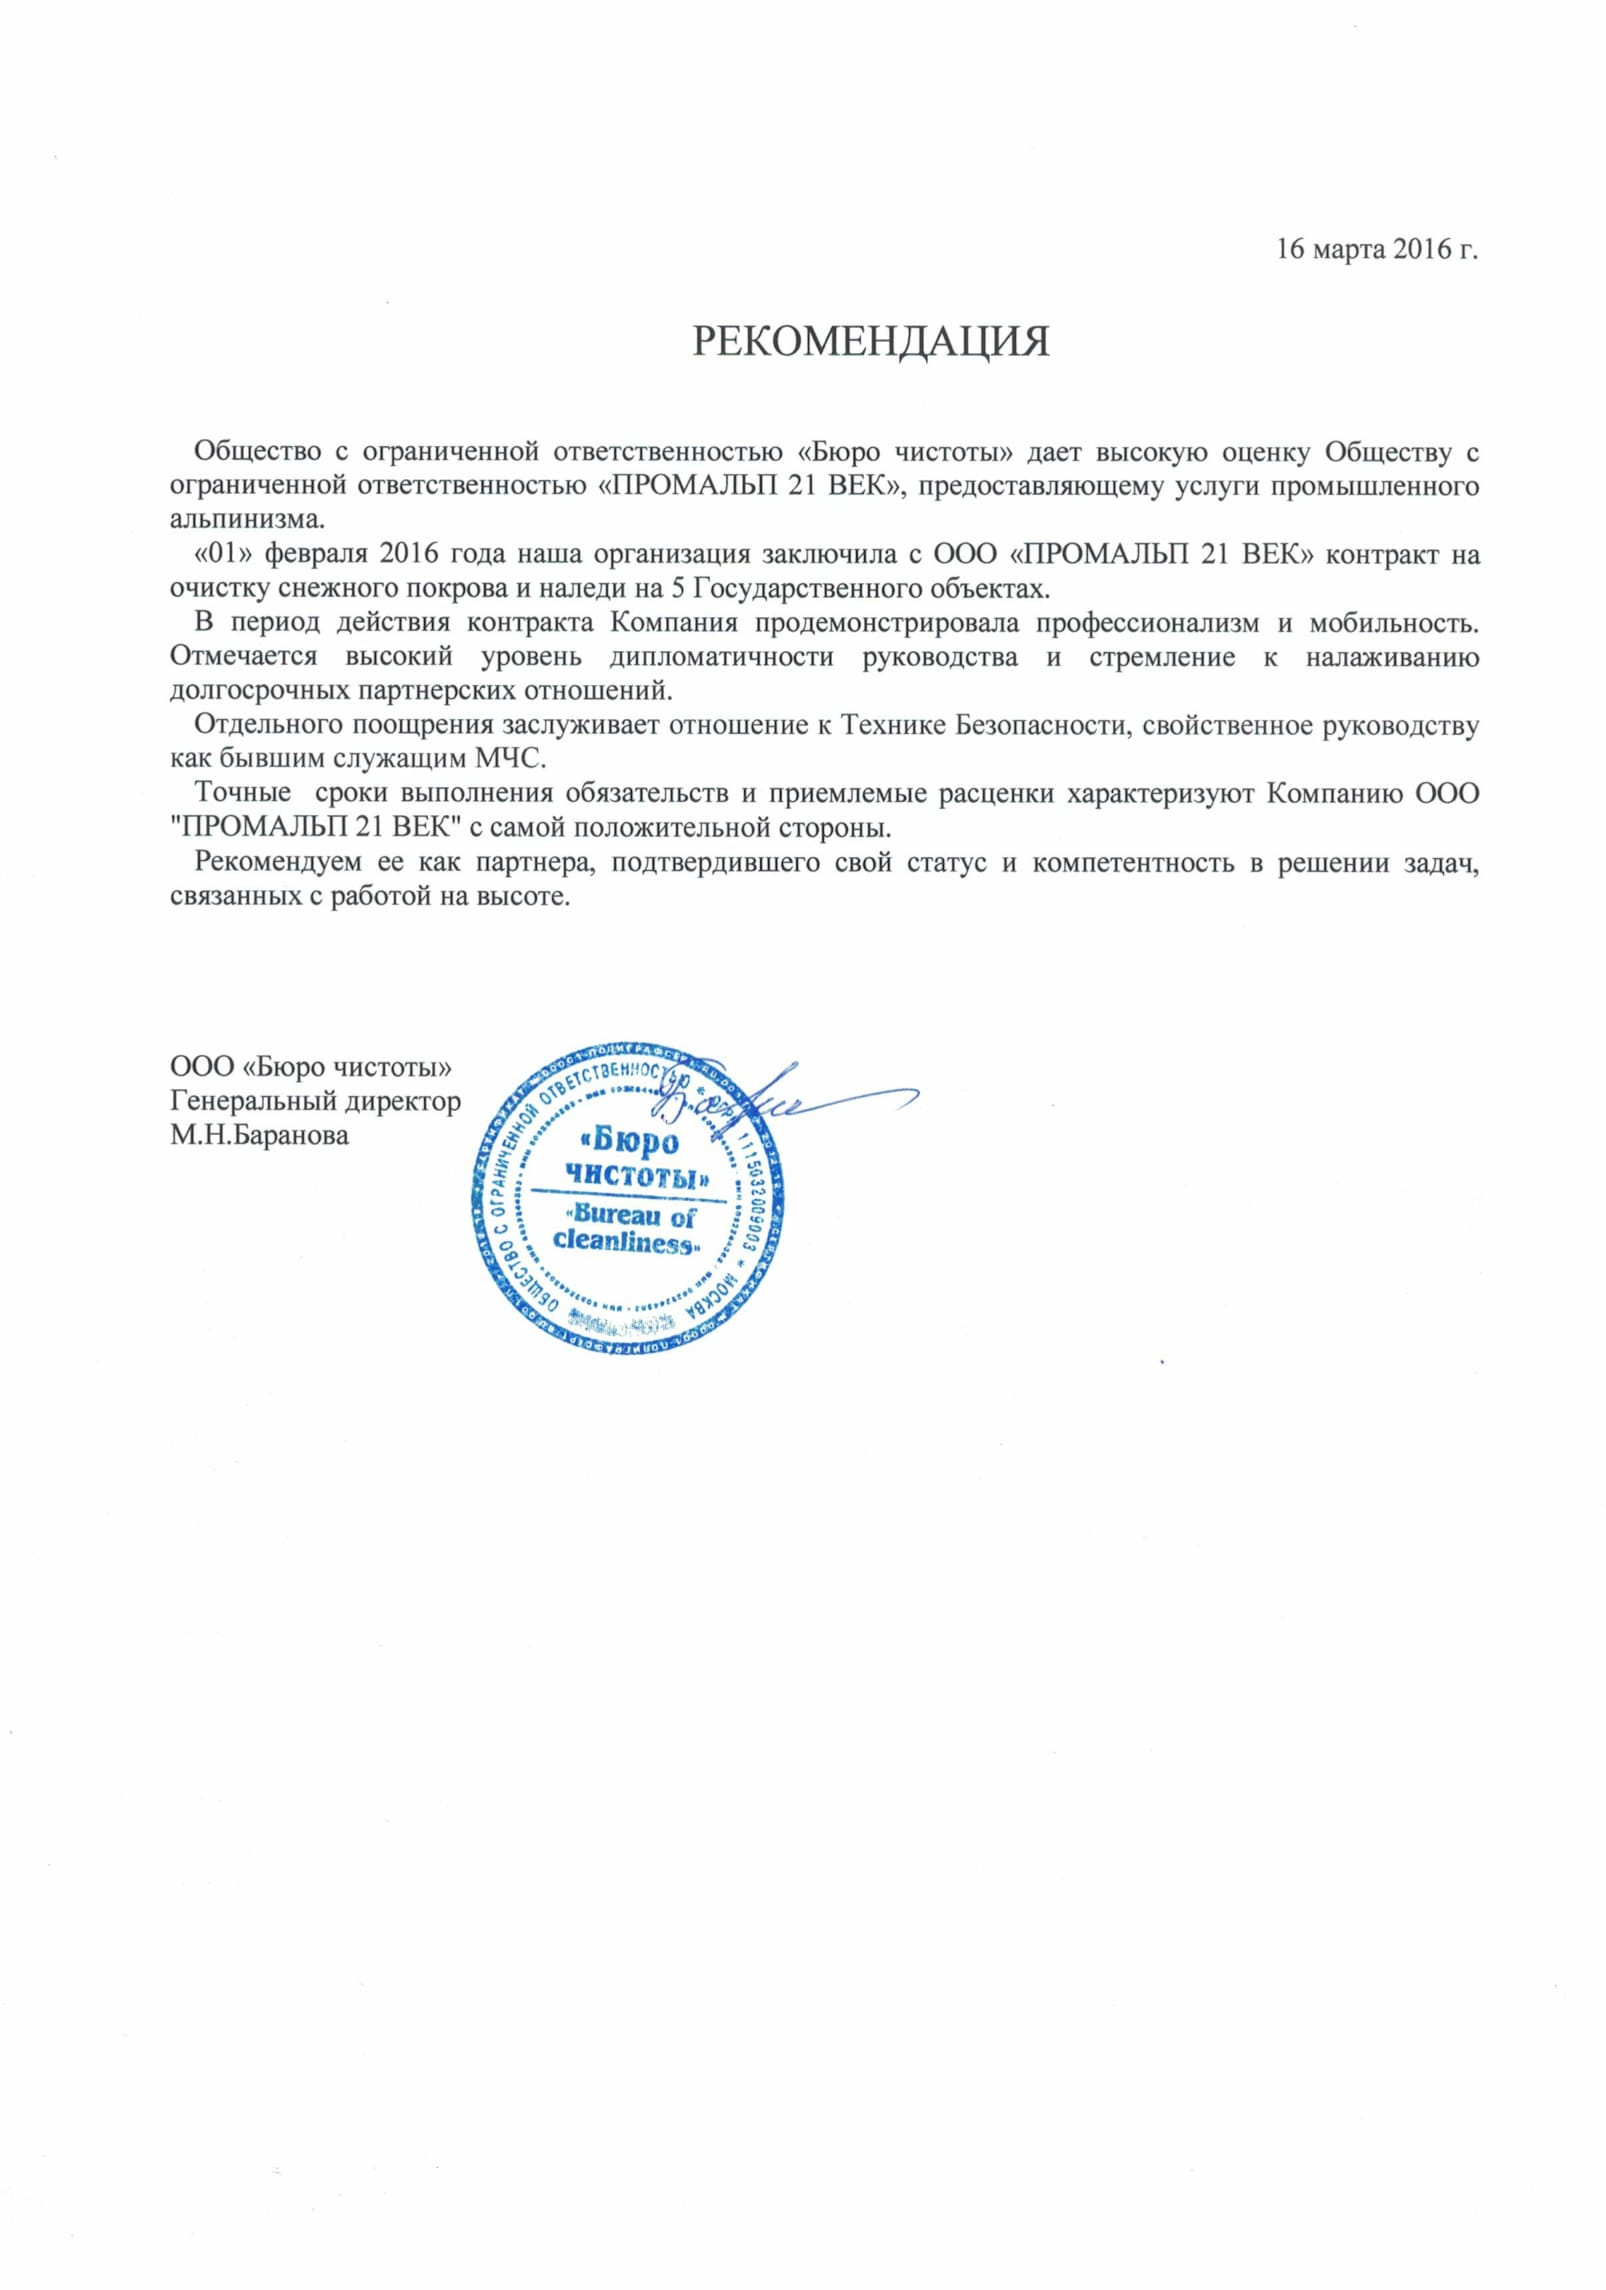 "ООО ""БЮРО ЧИСТОТЫ"" – Рекомендация"